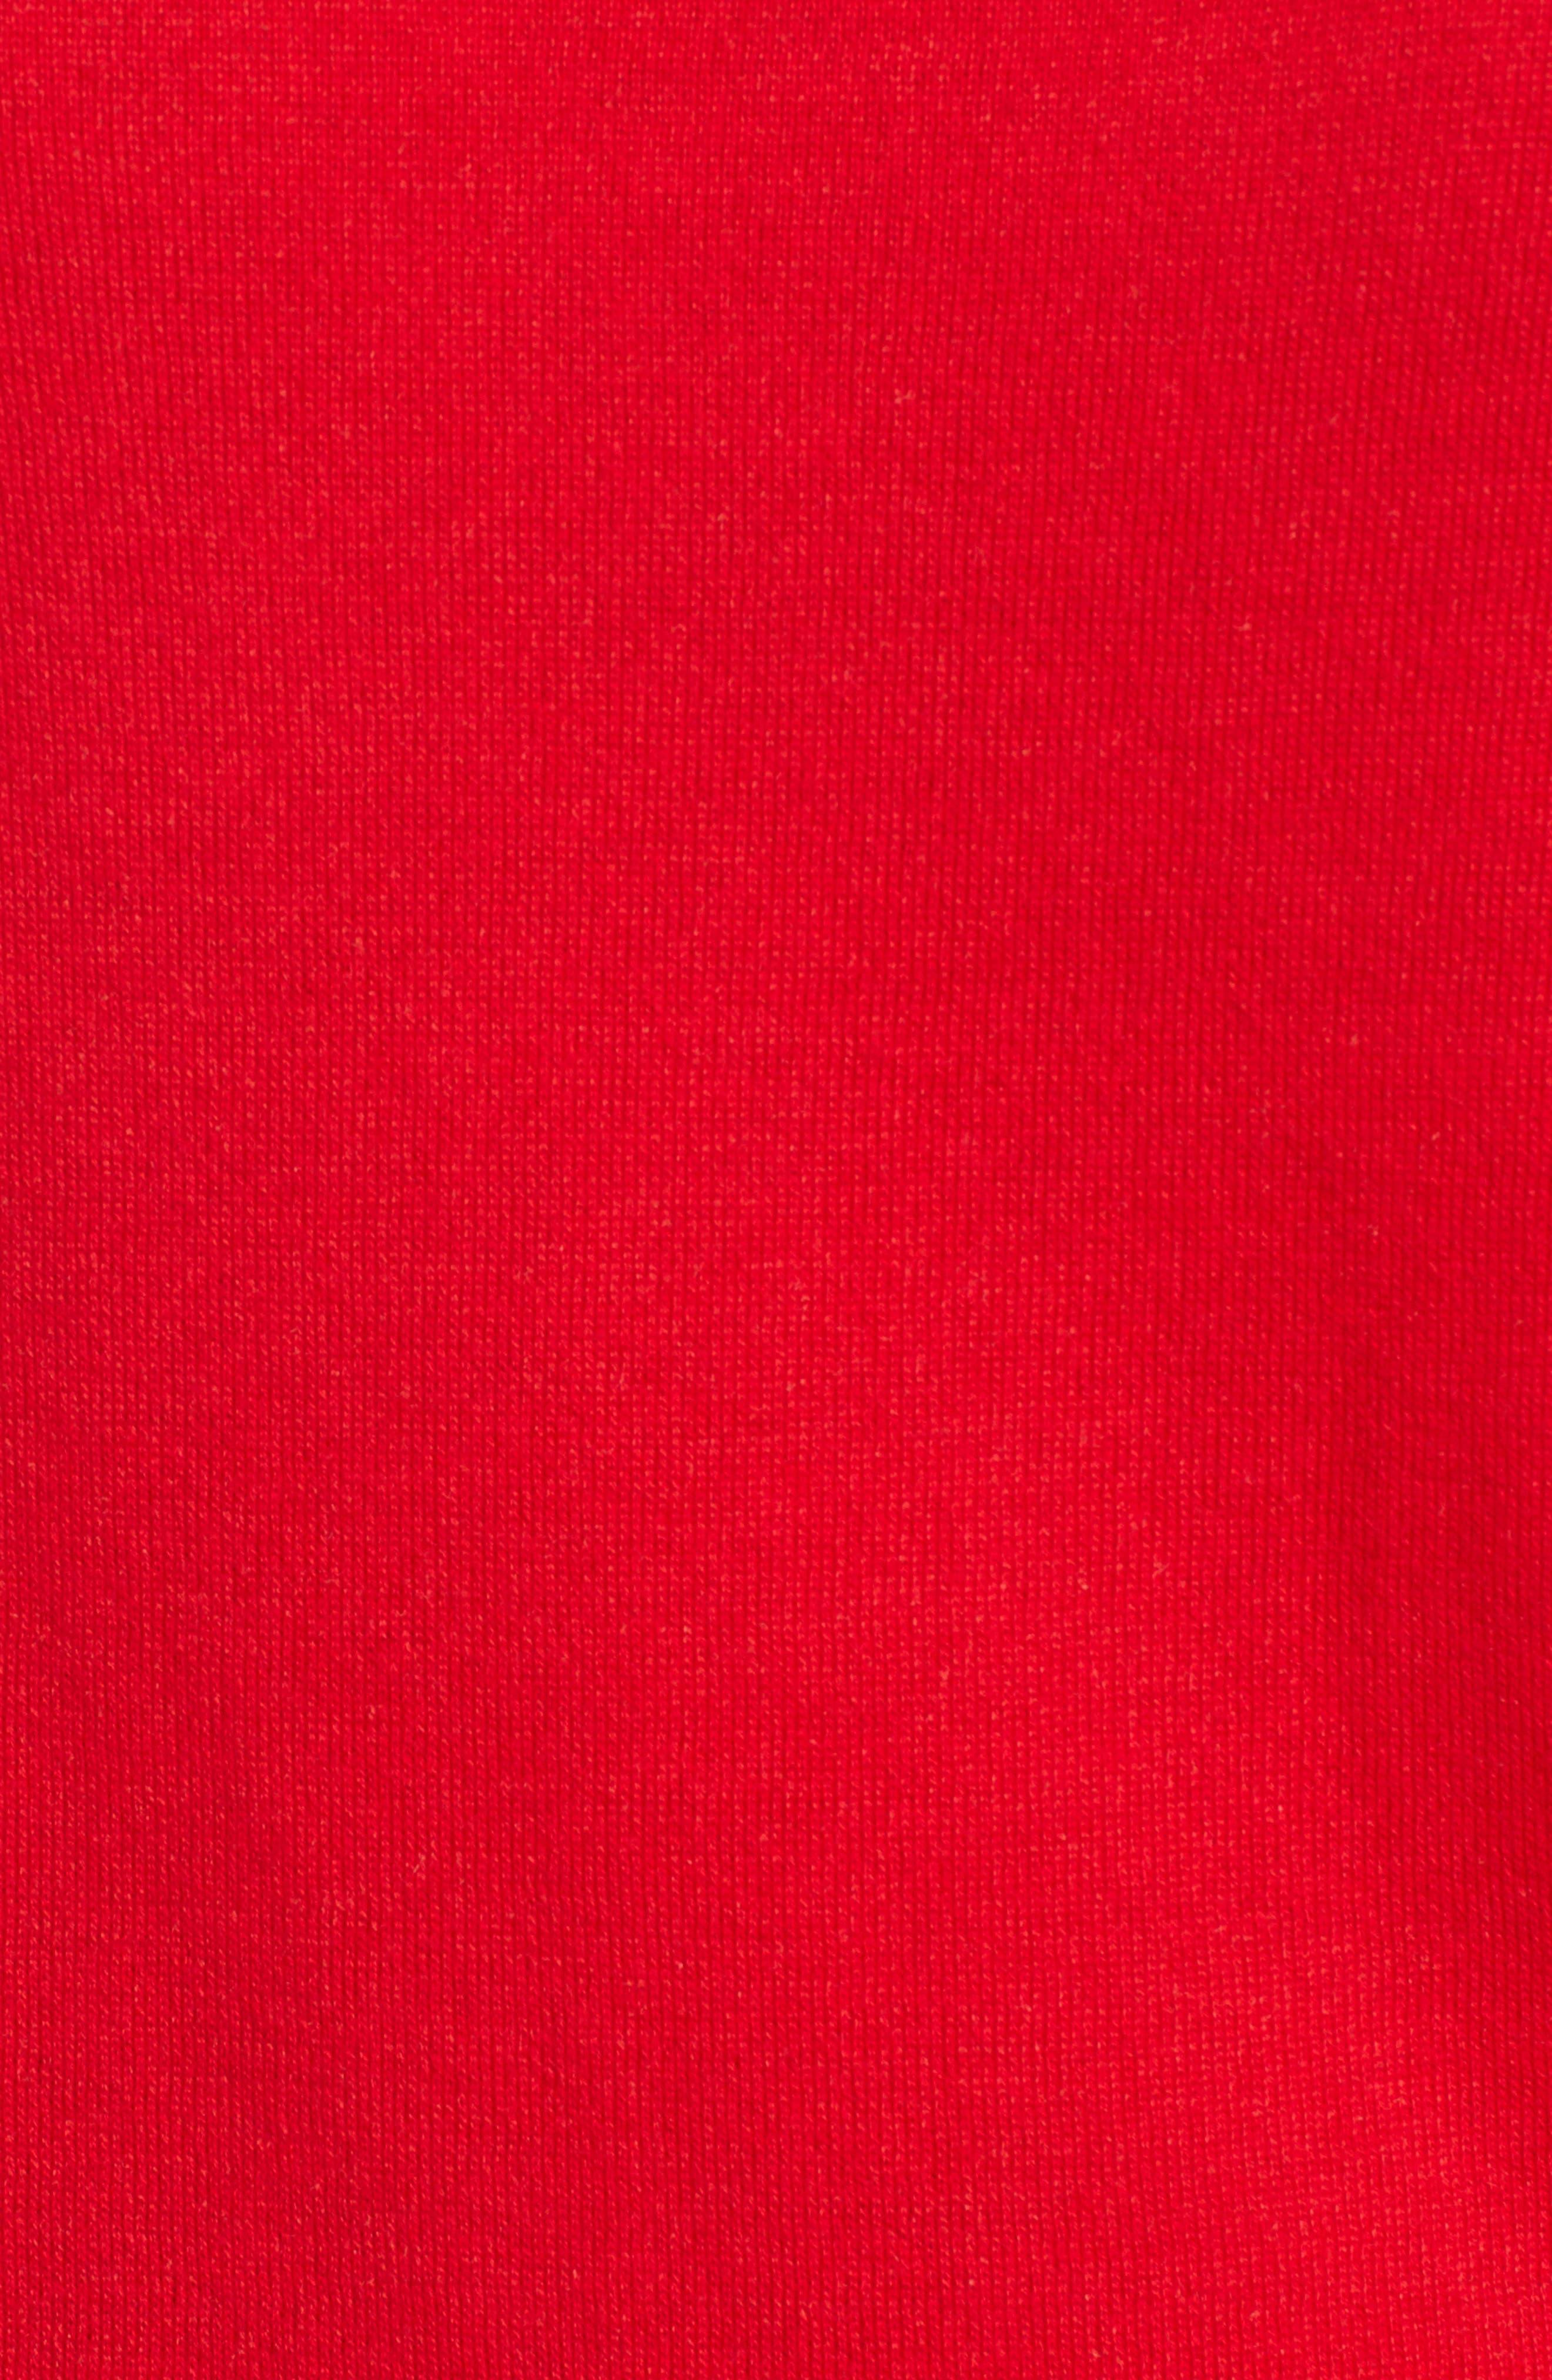 Lightweight Sweater,                             Alternate thumbnail 24, color,